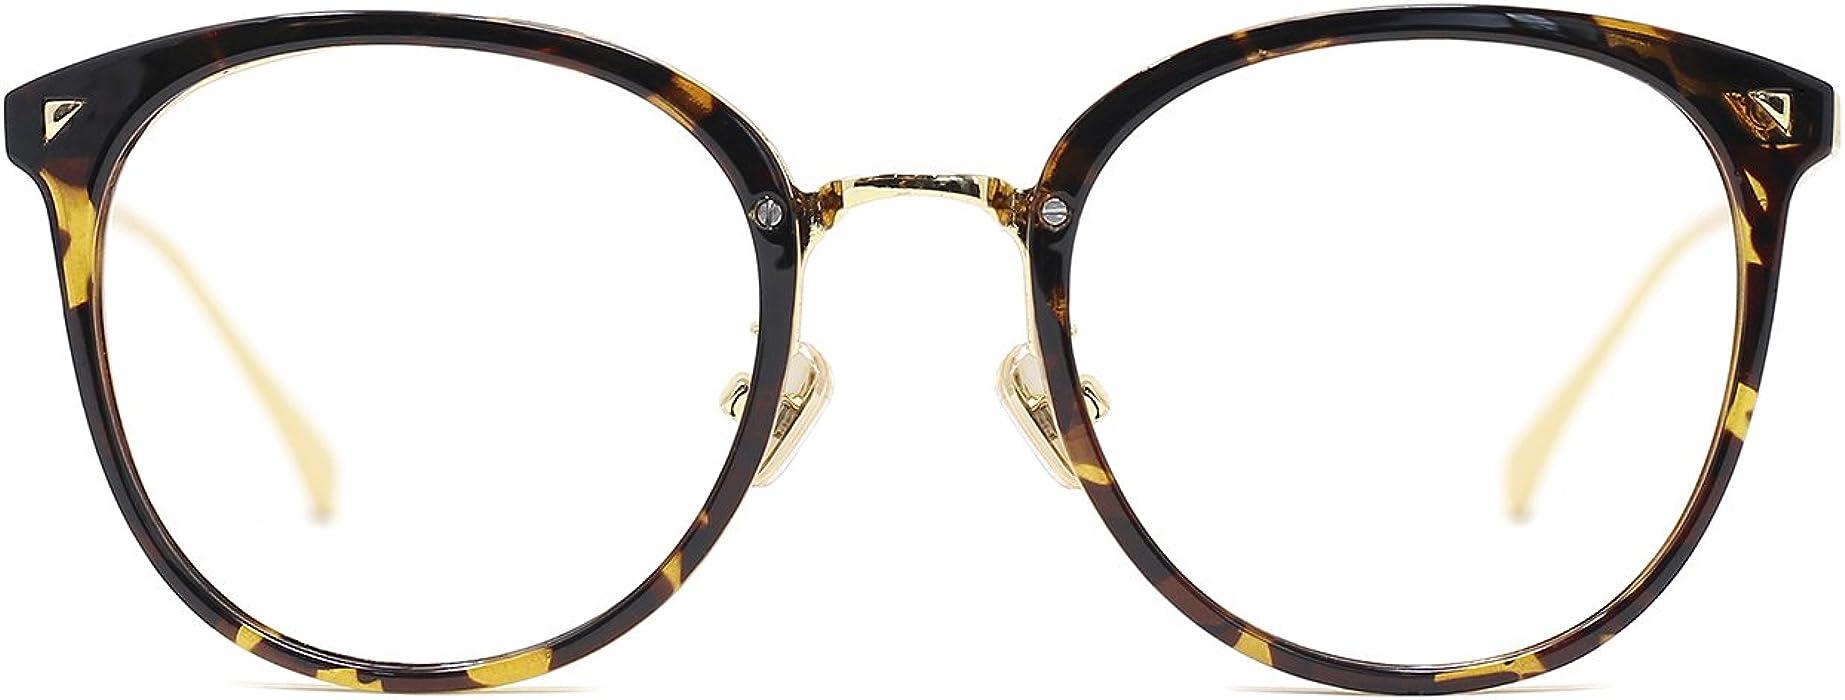 01f3c5a6228 TIJN Women Retro TR90 Metal Round Glasses Frame Optical Rx-able Eyeglasses -Maaike